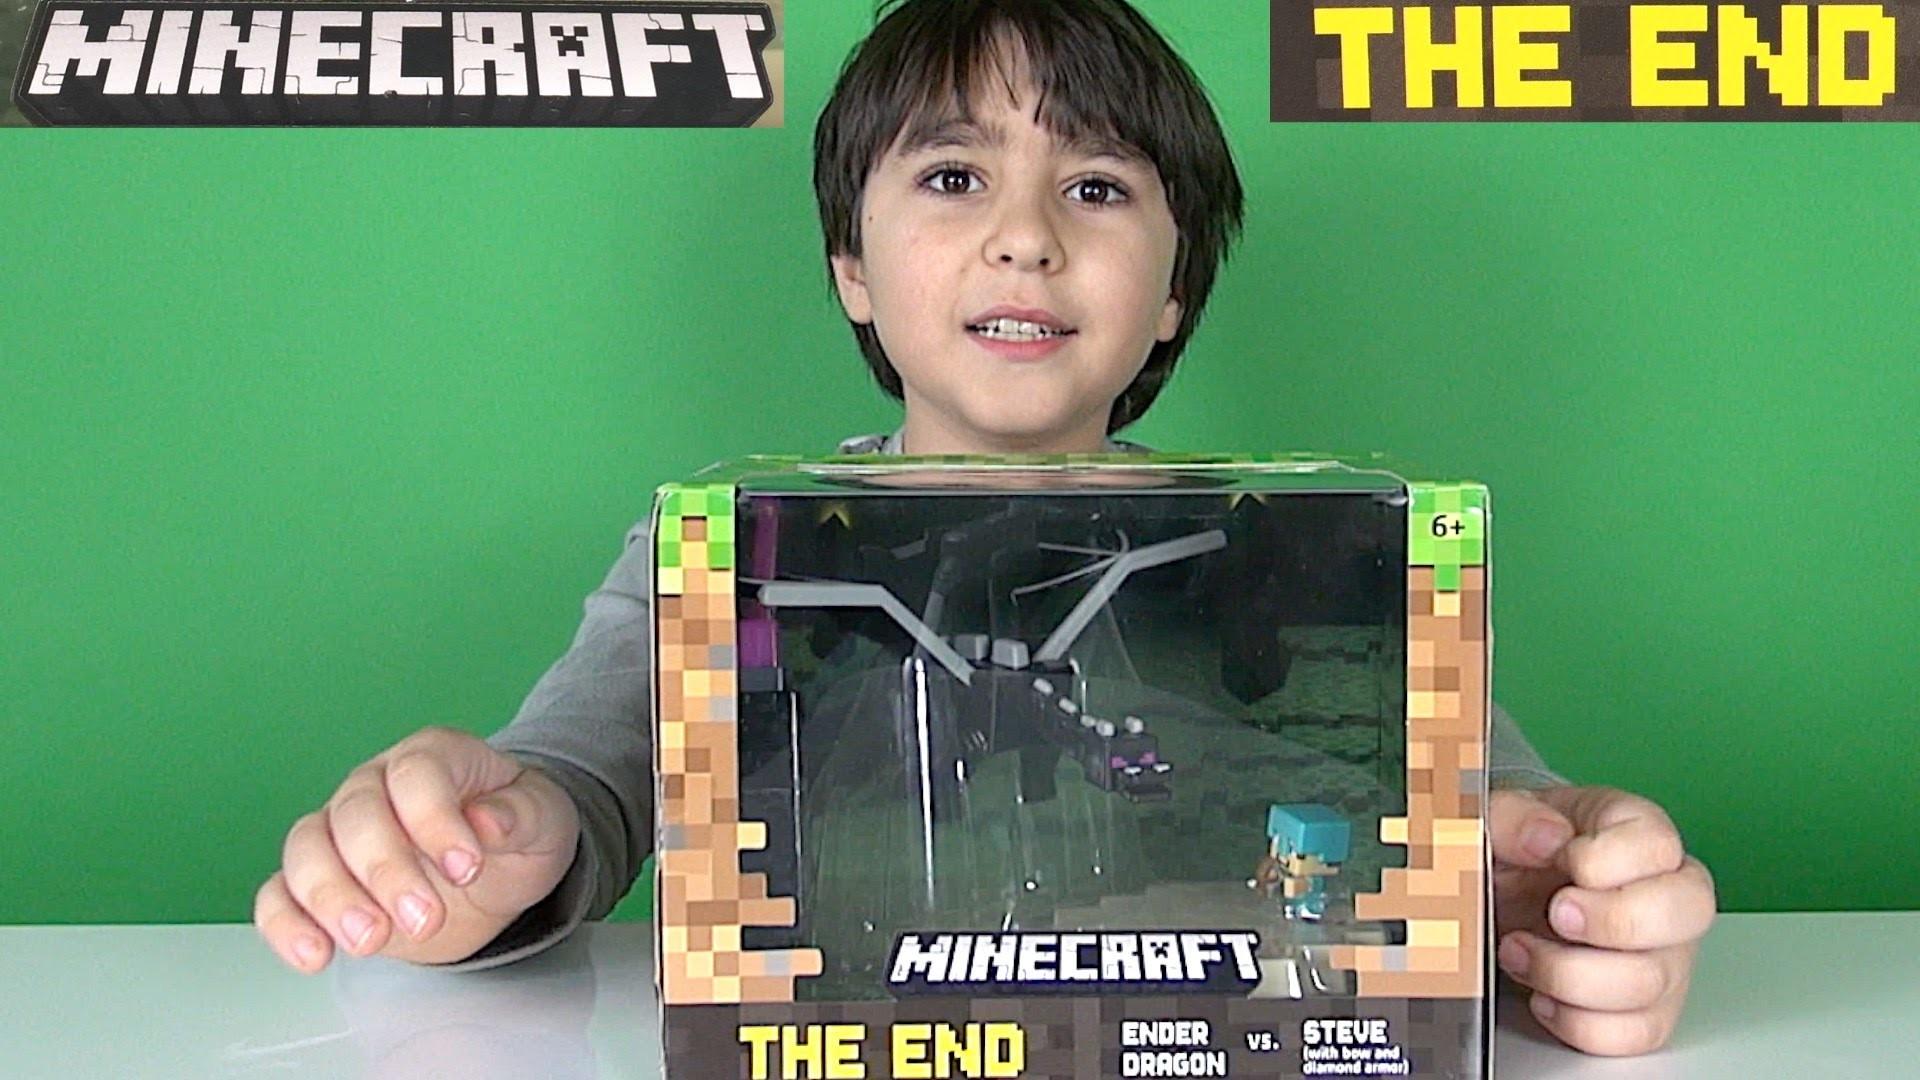 Res: 1920x1080, Minecraft The End - Ender Dragon vs Steve - Minecraft Battle